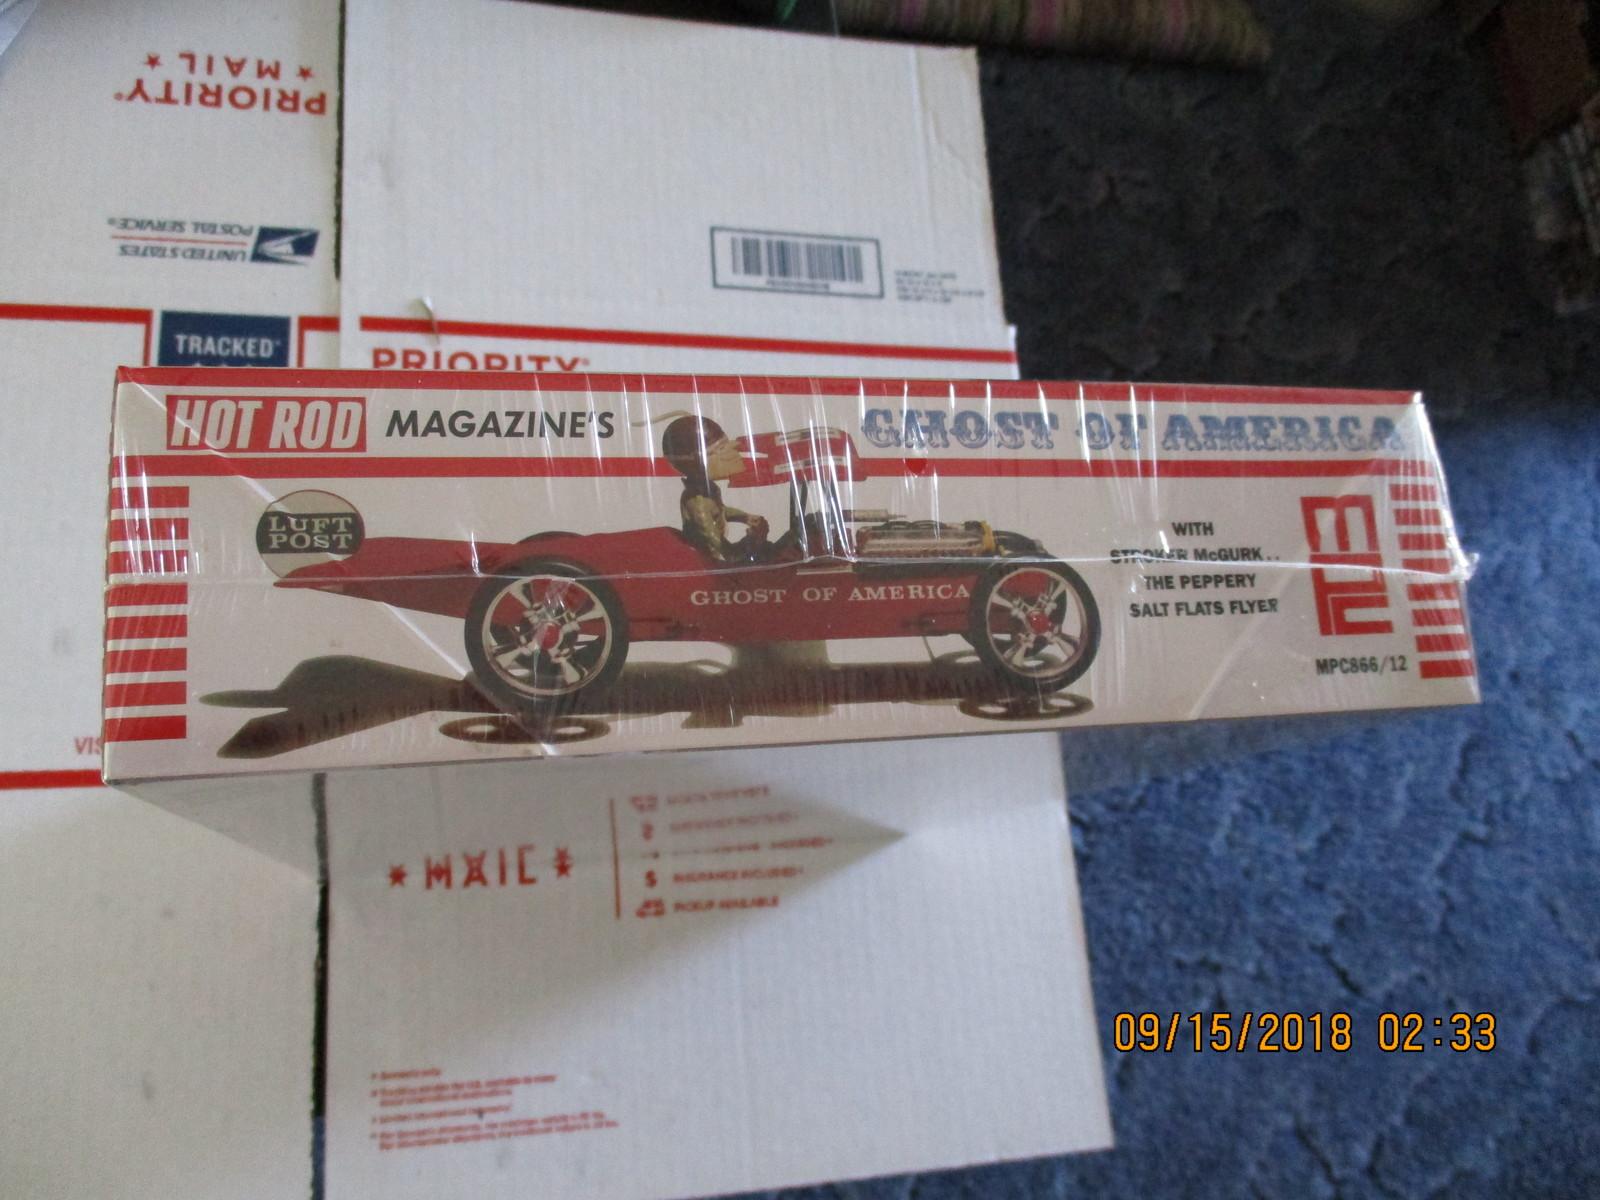 MPC Hot Rod Magazines RETO Stroker McGurk Ghost of America Hot Rod 1/18 scale